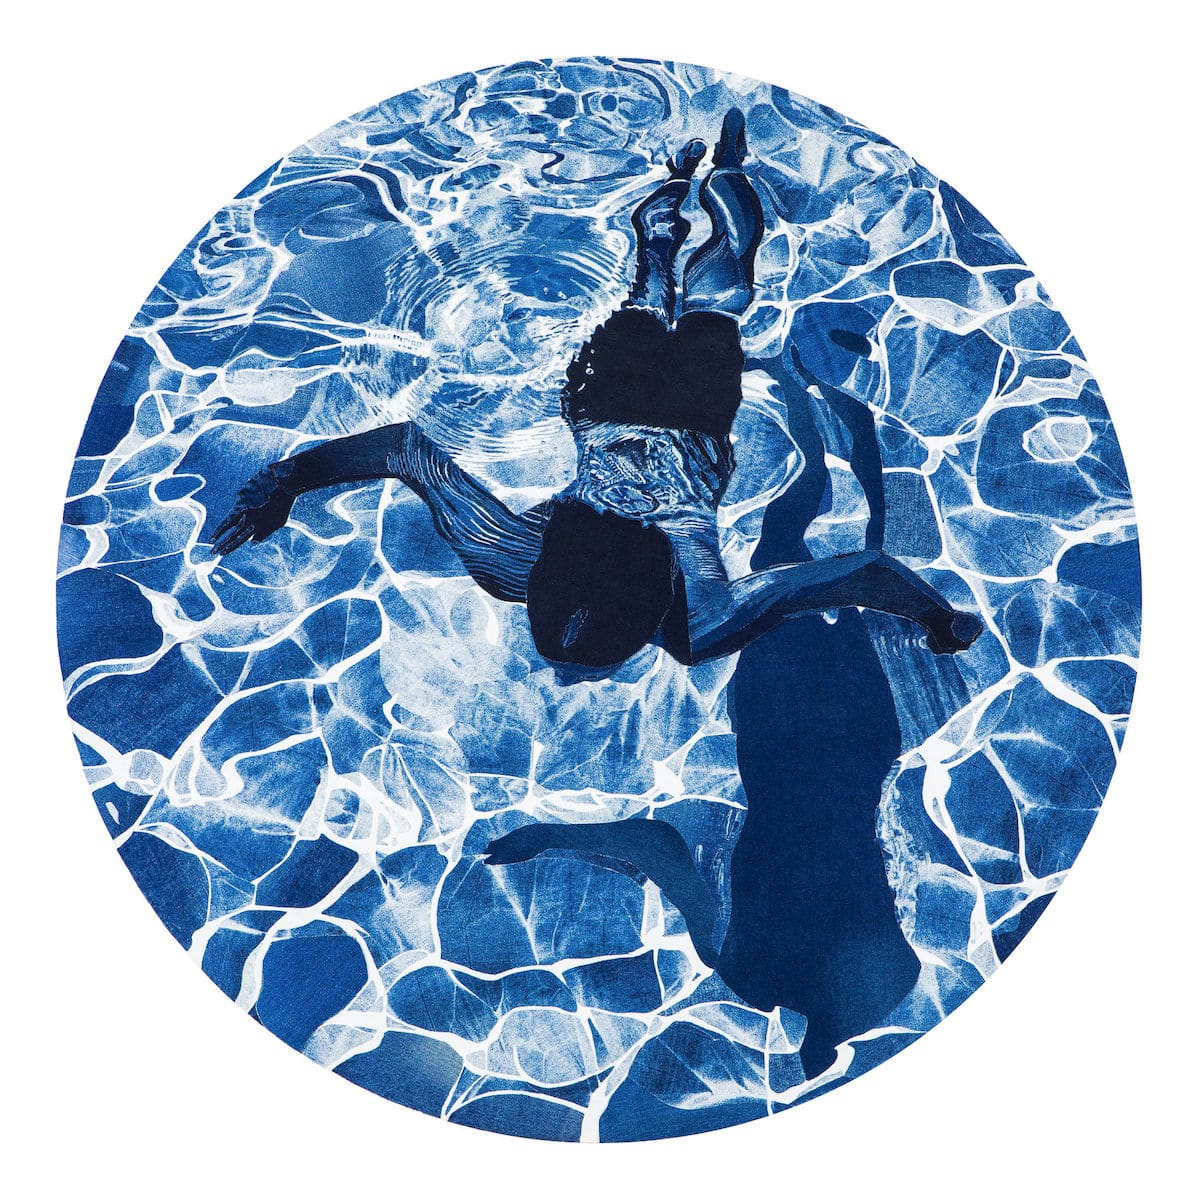 Ian-Berry-Denim-Art-Hotel-California-8